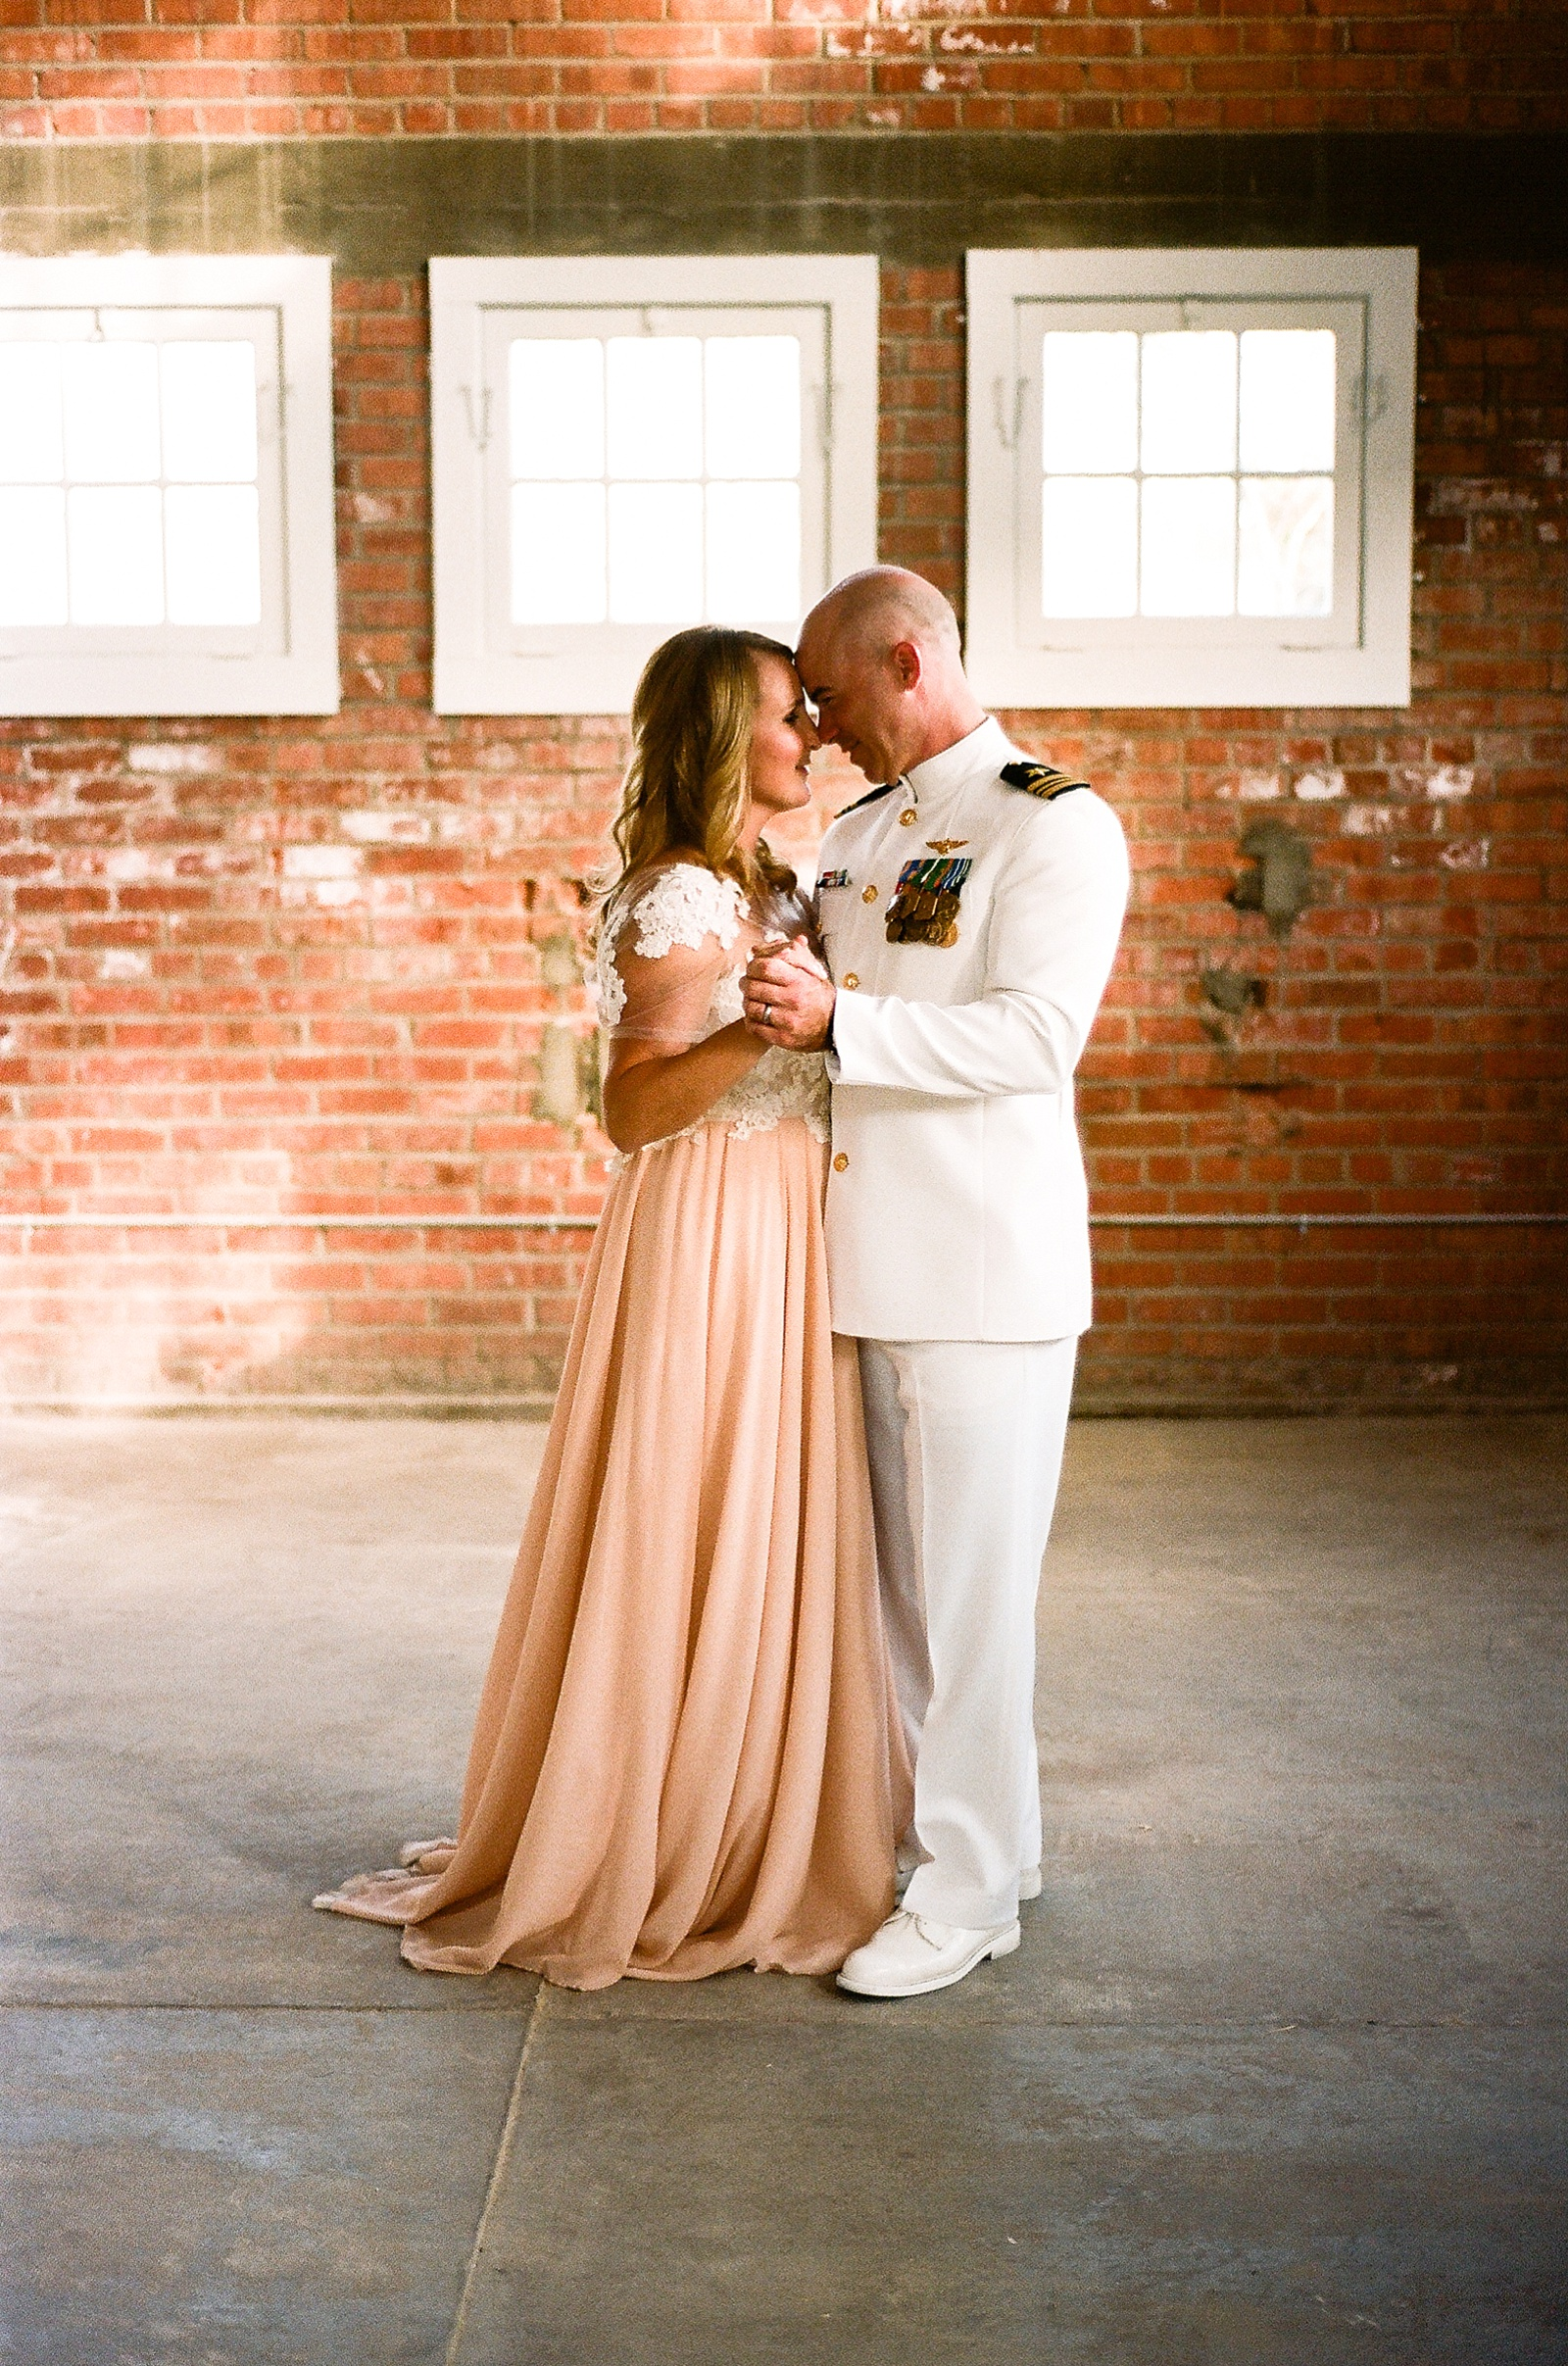 V&V Wedding at 828 by Lauren Nygard_film-016